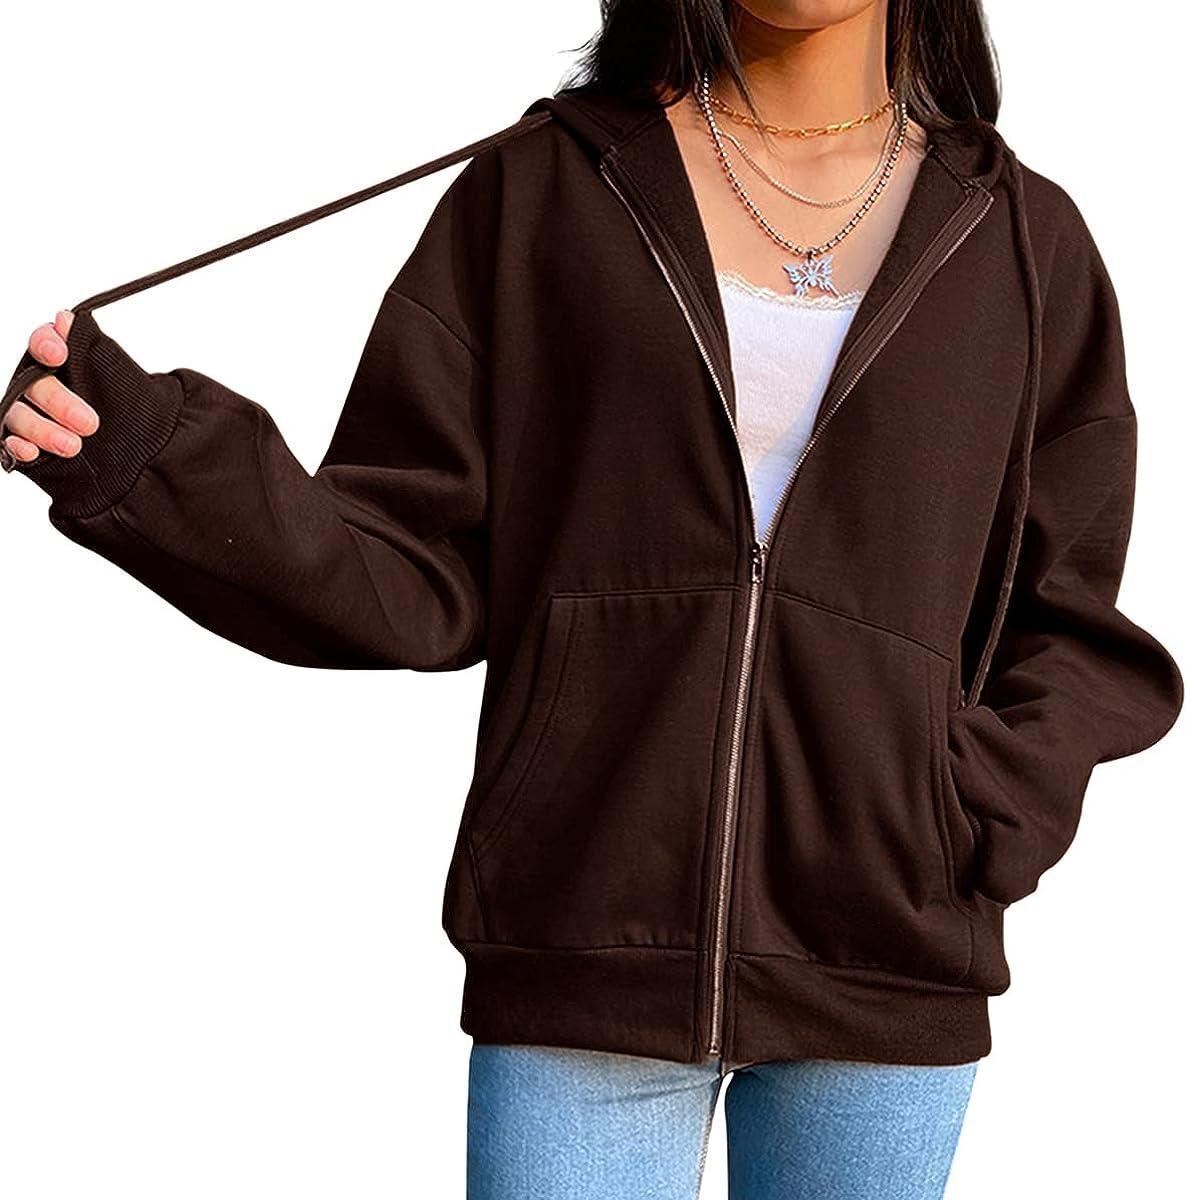 Meladyan Women Y2K Aesthetic Oversized Zip Up Hoodie Solid Fleece Long Sleeve Kangaroo Pocket Sweatshirt Jacket Pullover